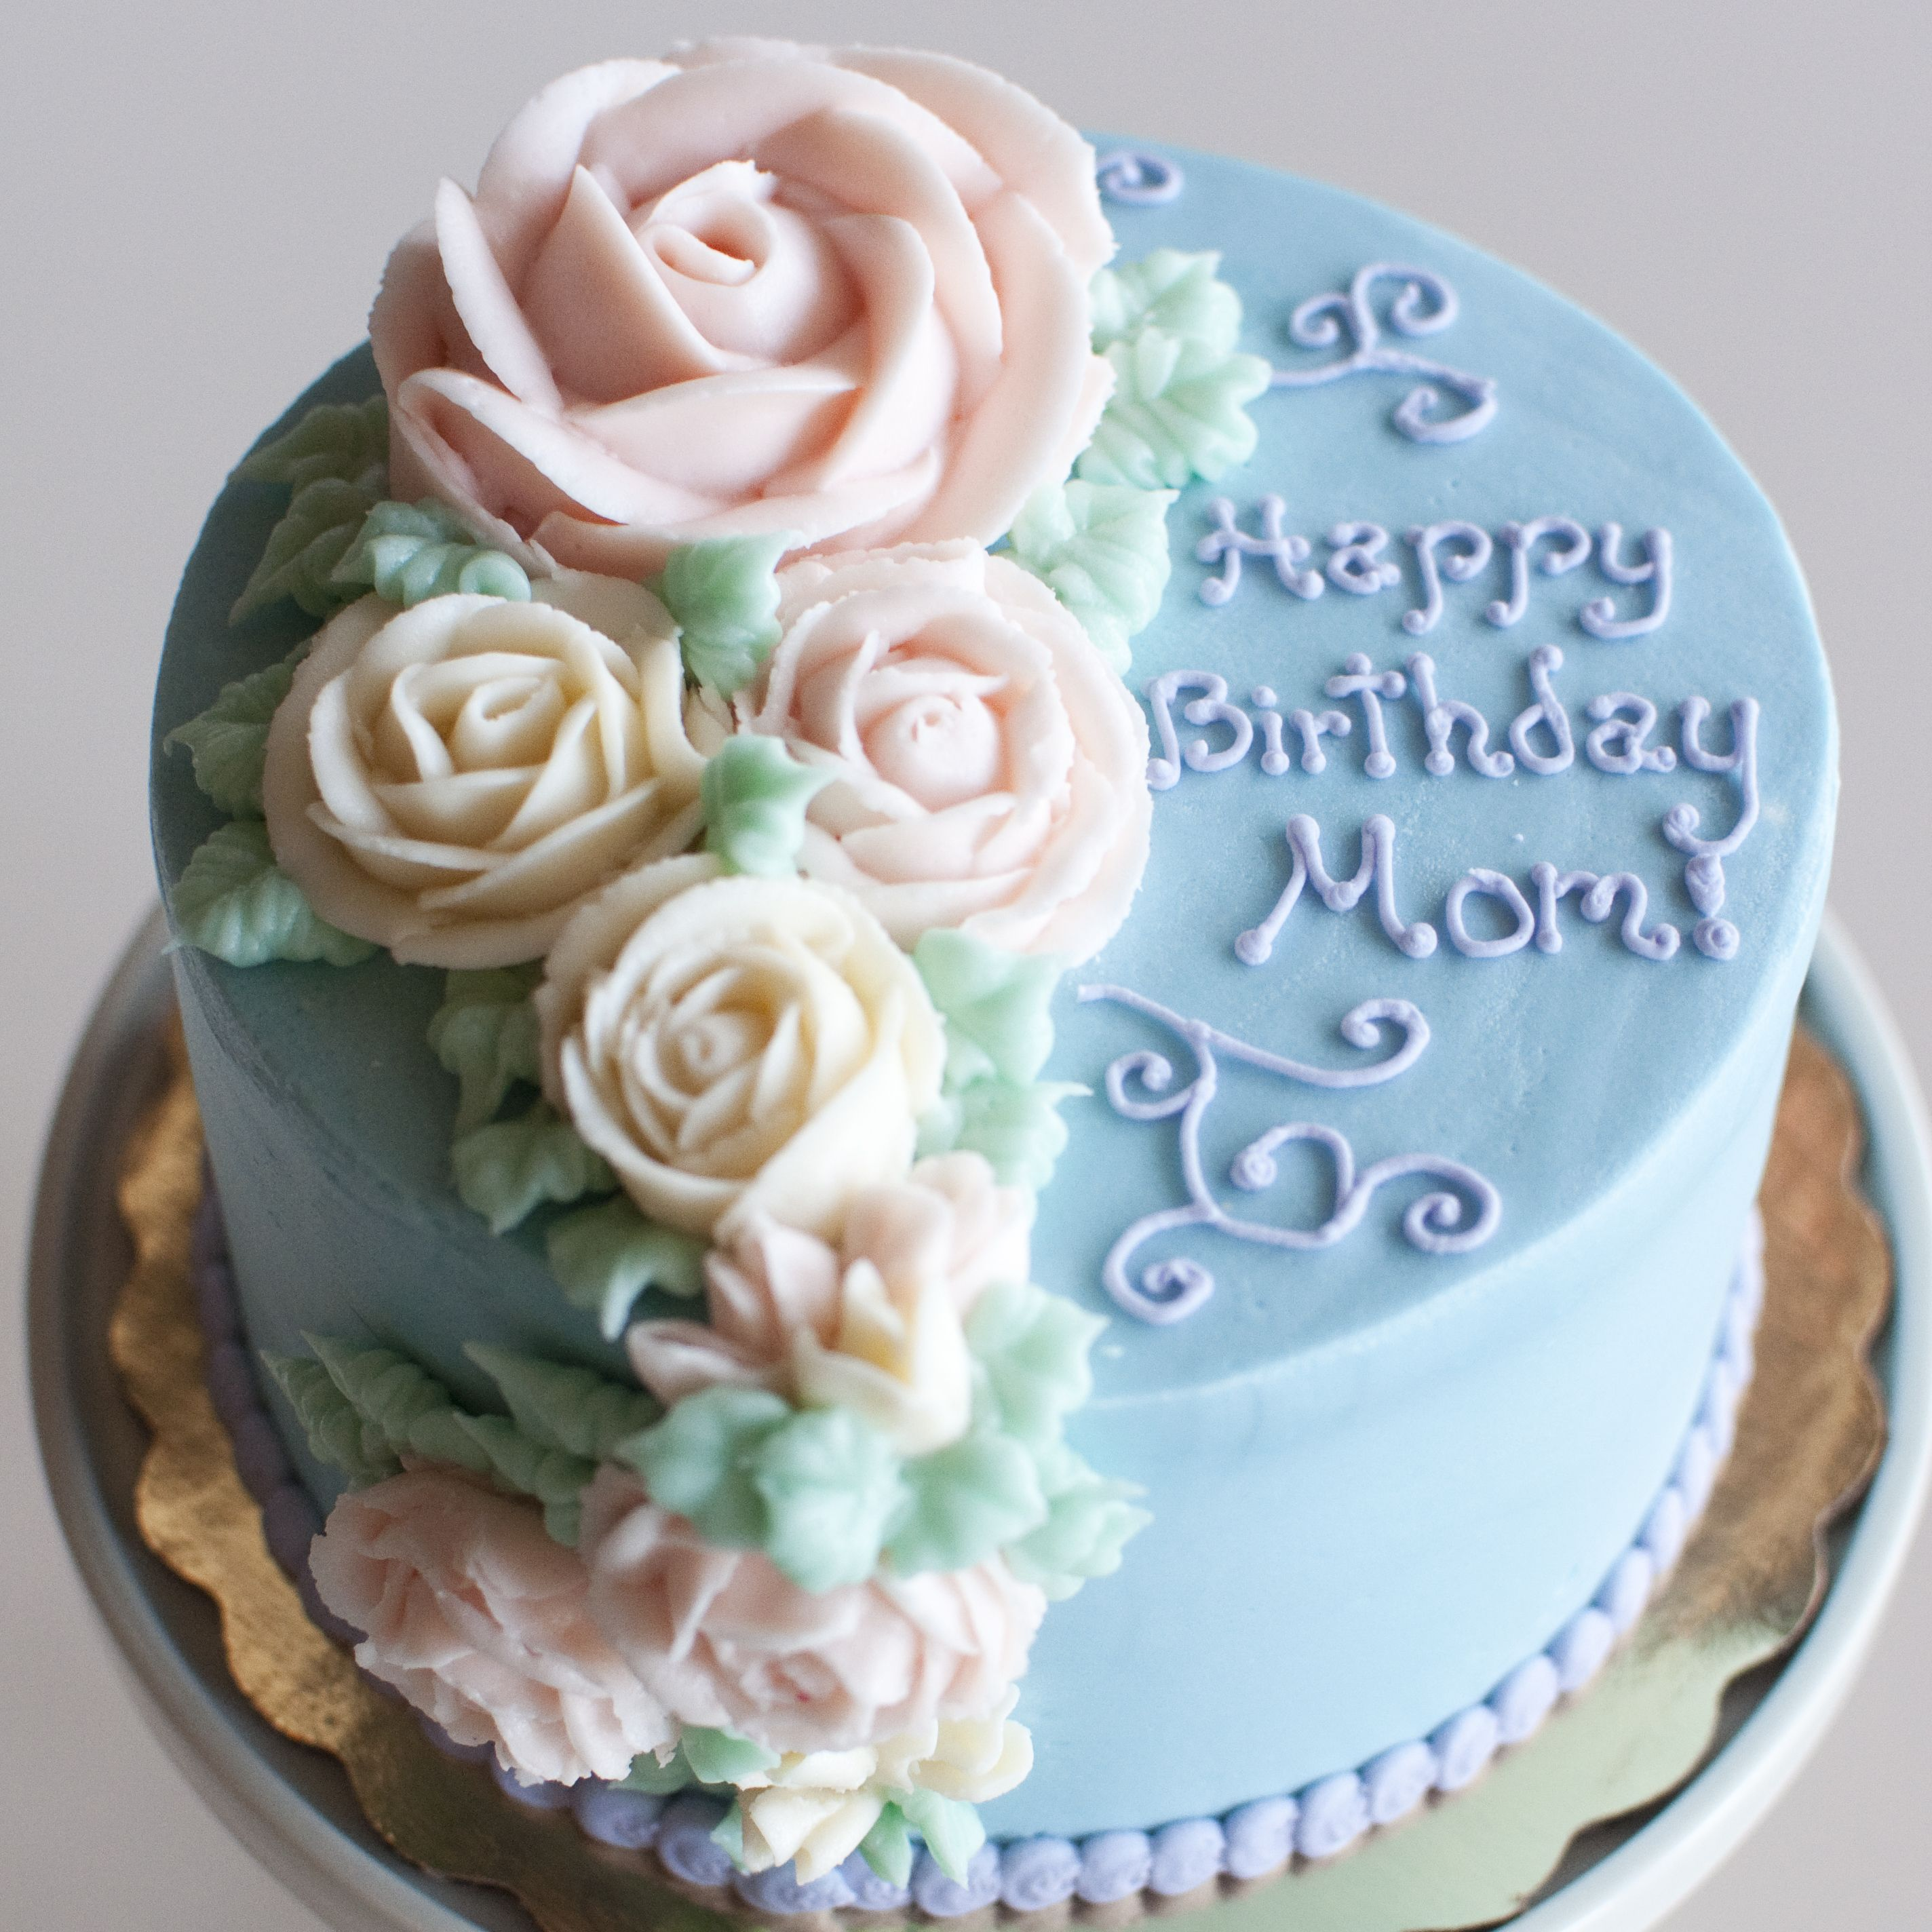 Groovy Happy Birthday Rose Birthday Cake Sugar Flowers Bird Bakery Birthday Cards Printable Trancafe Filternl